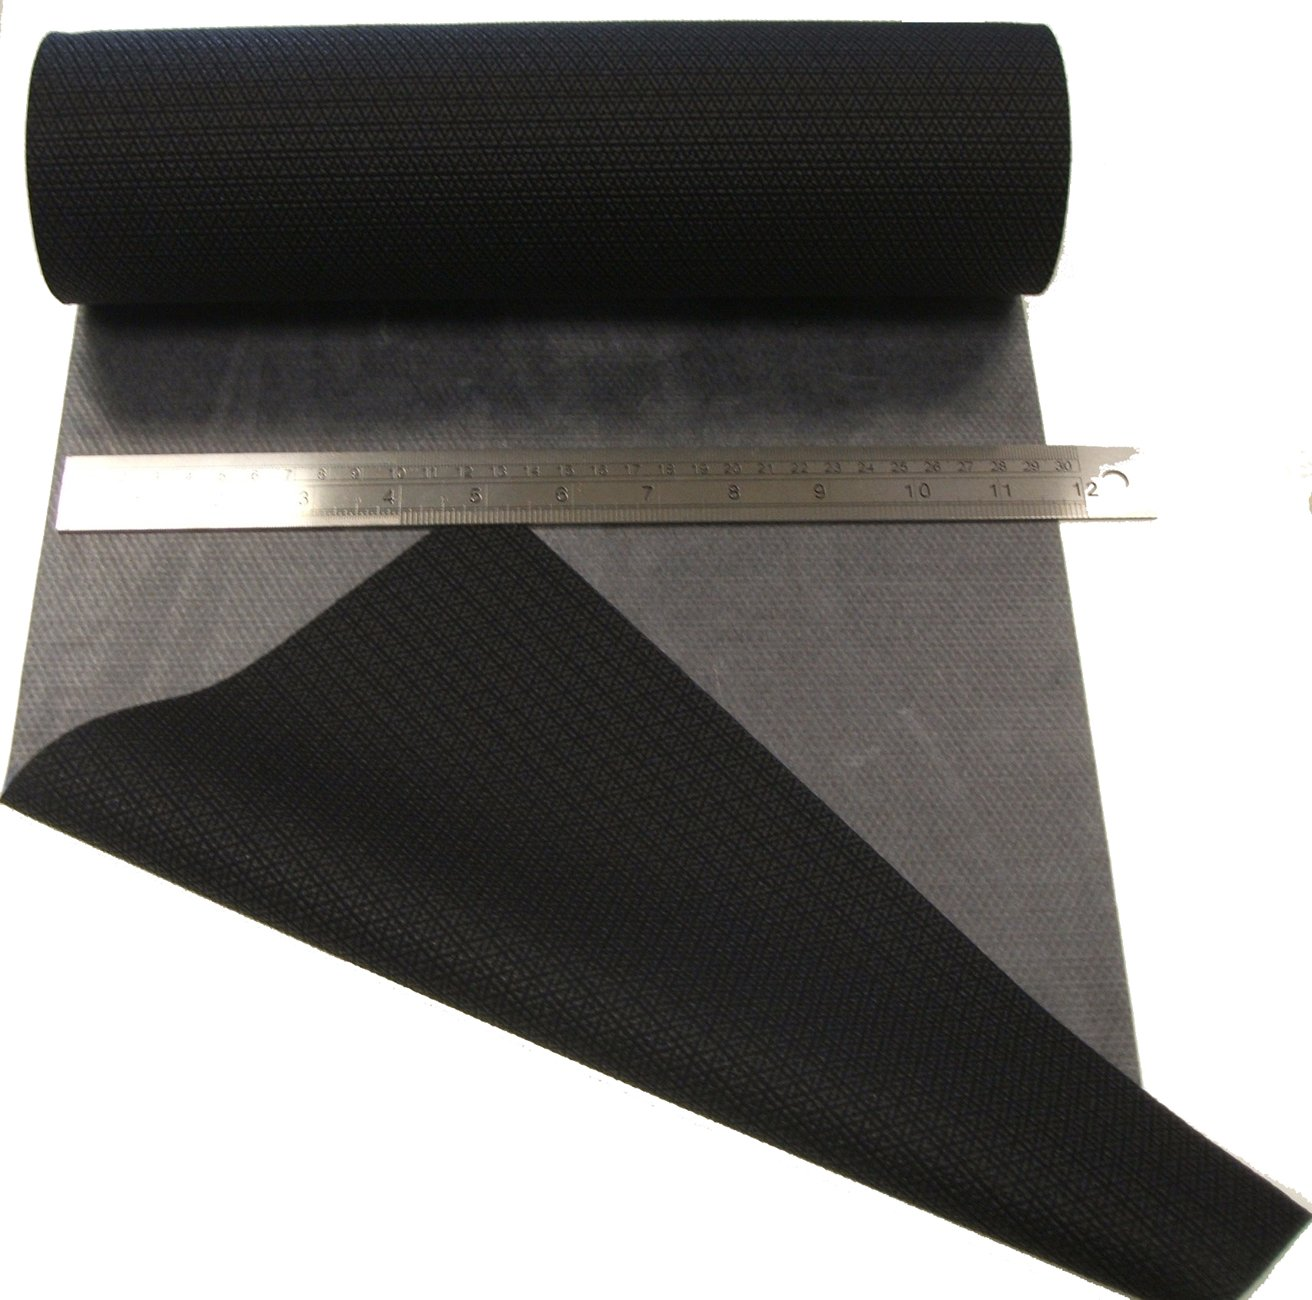 0,5 metros Repare Patch Material de Melco T-5500 -traje isotérmico / traje seco, Scuba - adhesivo termofusible, aplicar con plancha eléctrico (Negro, 300 mm Ancho) WBM Seam Tapes T-5500-300-BK